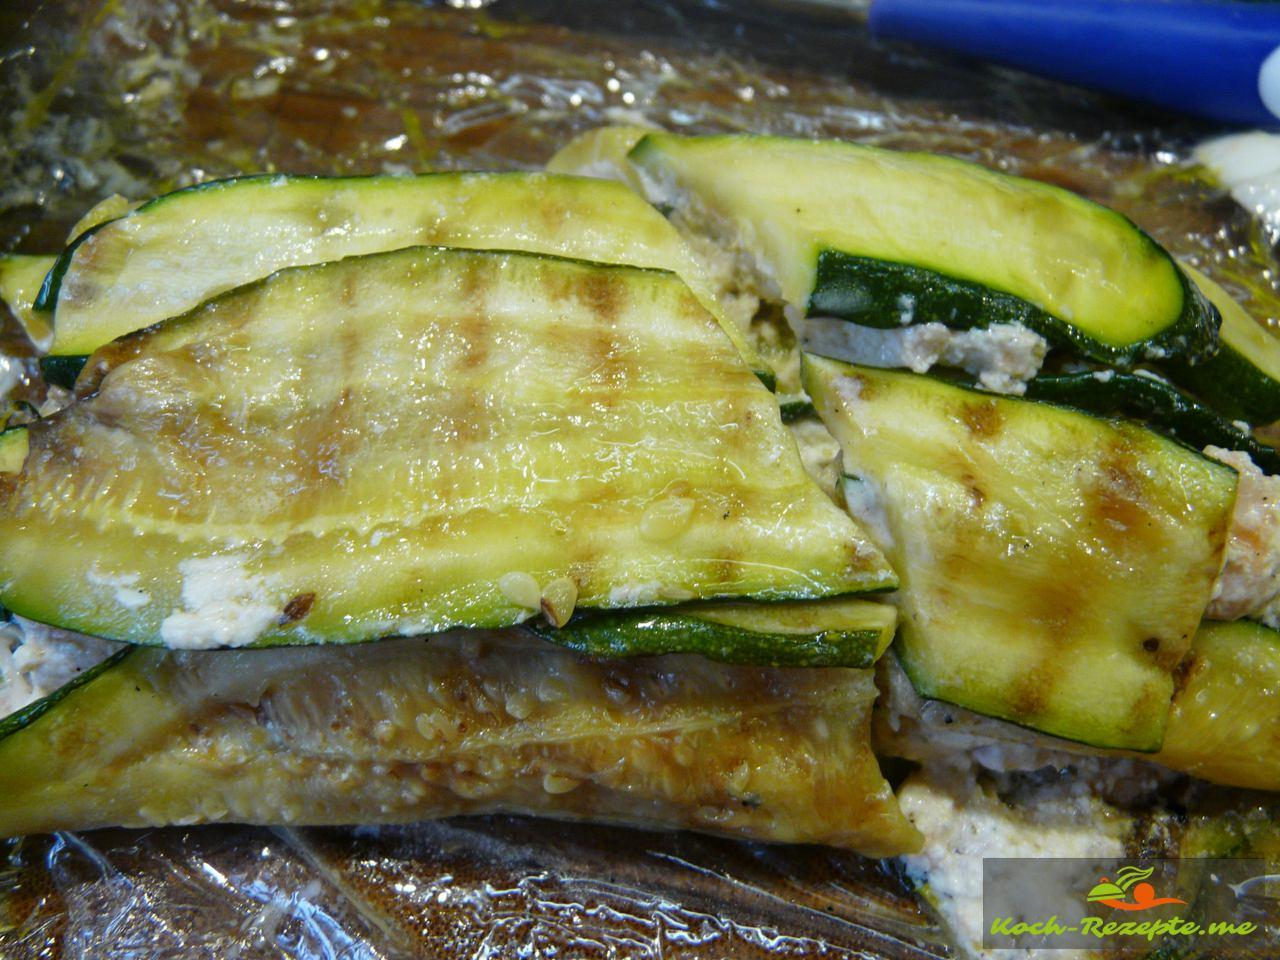 fertige Lachs-Zucchini Rolle ausgerollt